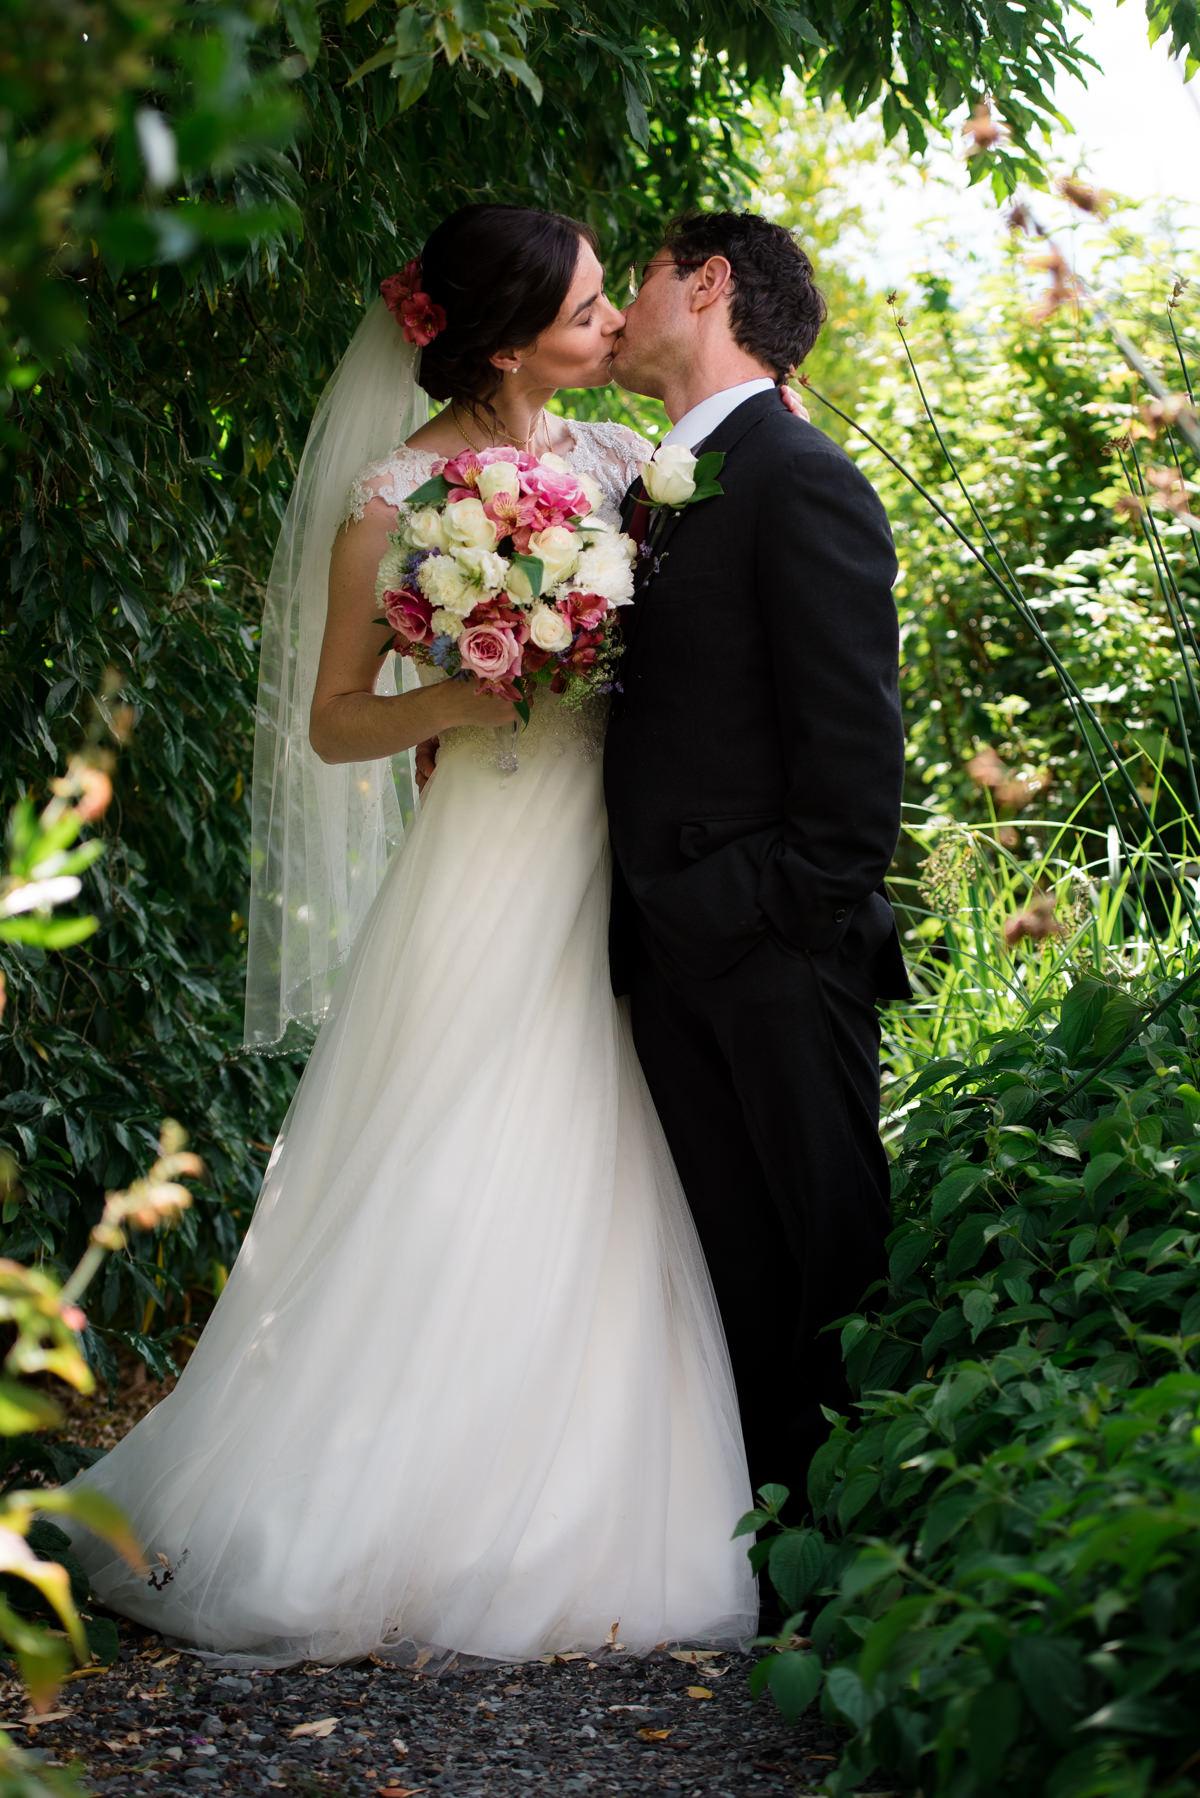 Andrew Tat - Documentary Wedding Photography - Kirkland, Washington - Emily & Cuauh - 24.JPG